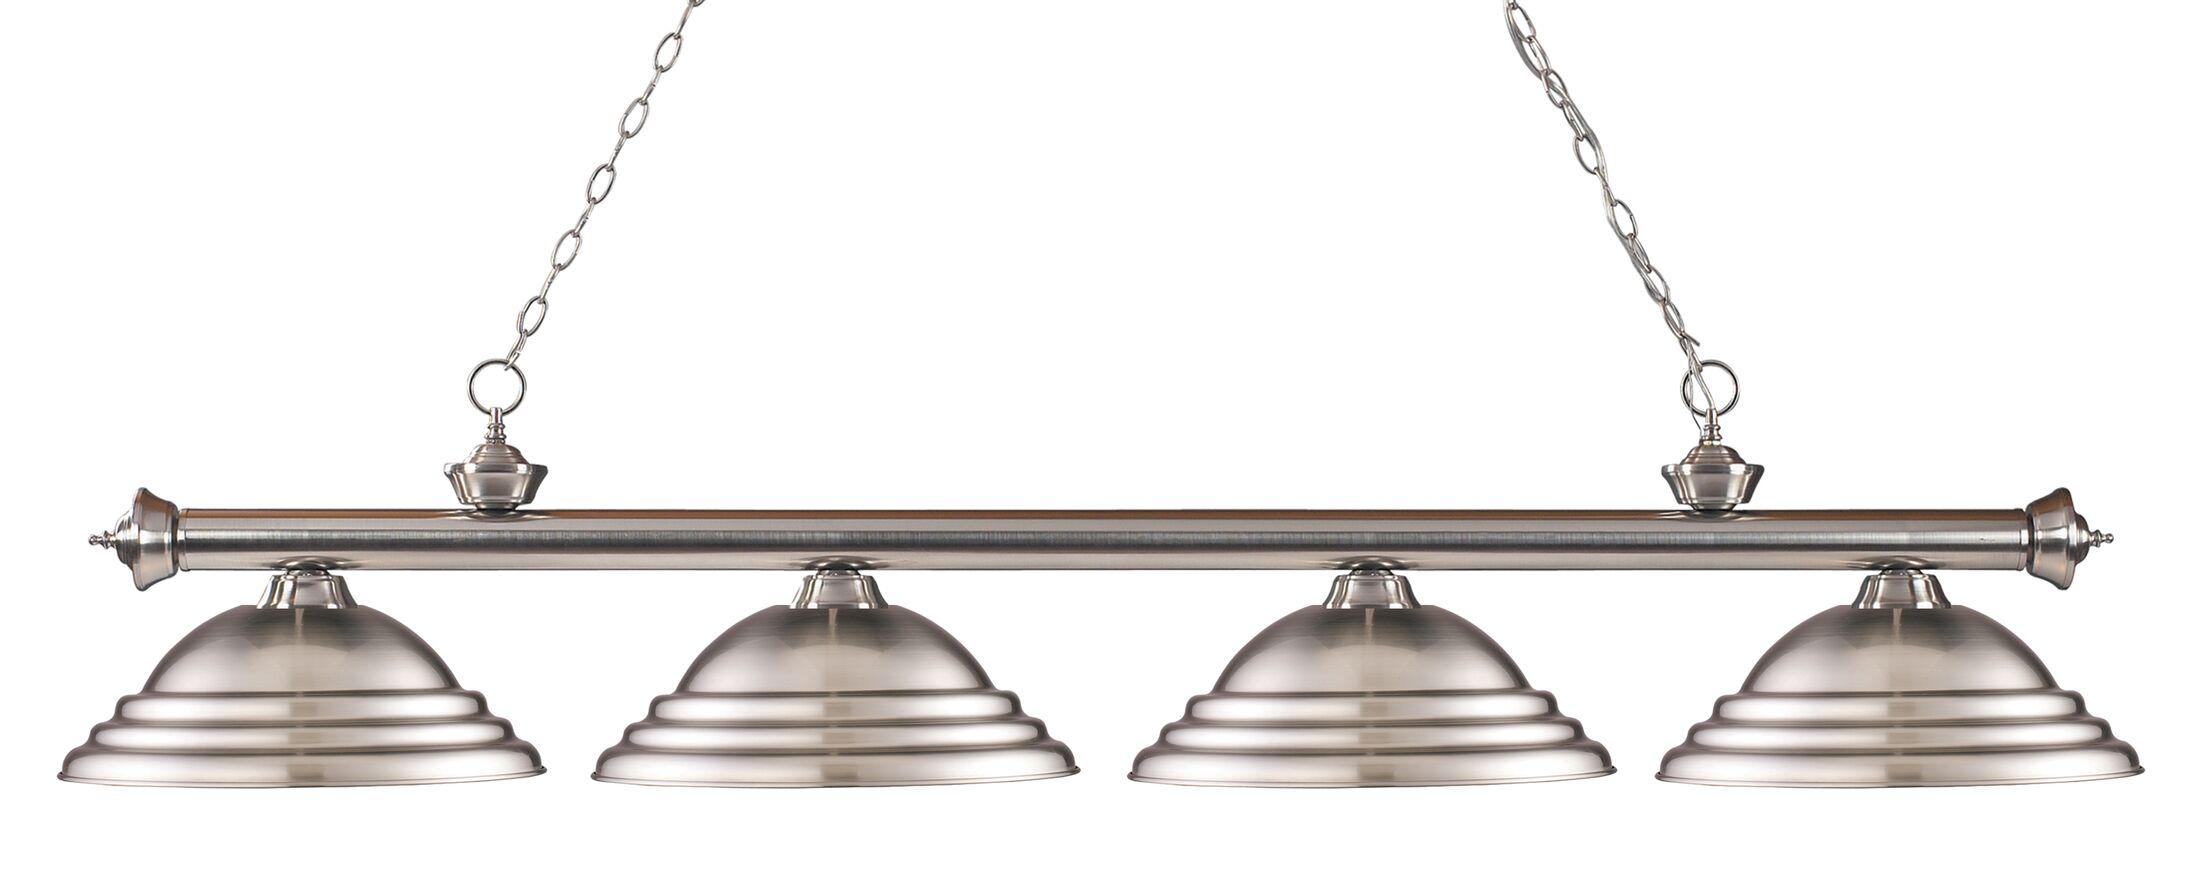 Zephyr 4-Light Metal Shade Kitchen Island Pendant Finish: Brushed Nickel, Shade Color: Brushed Nickel